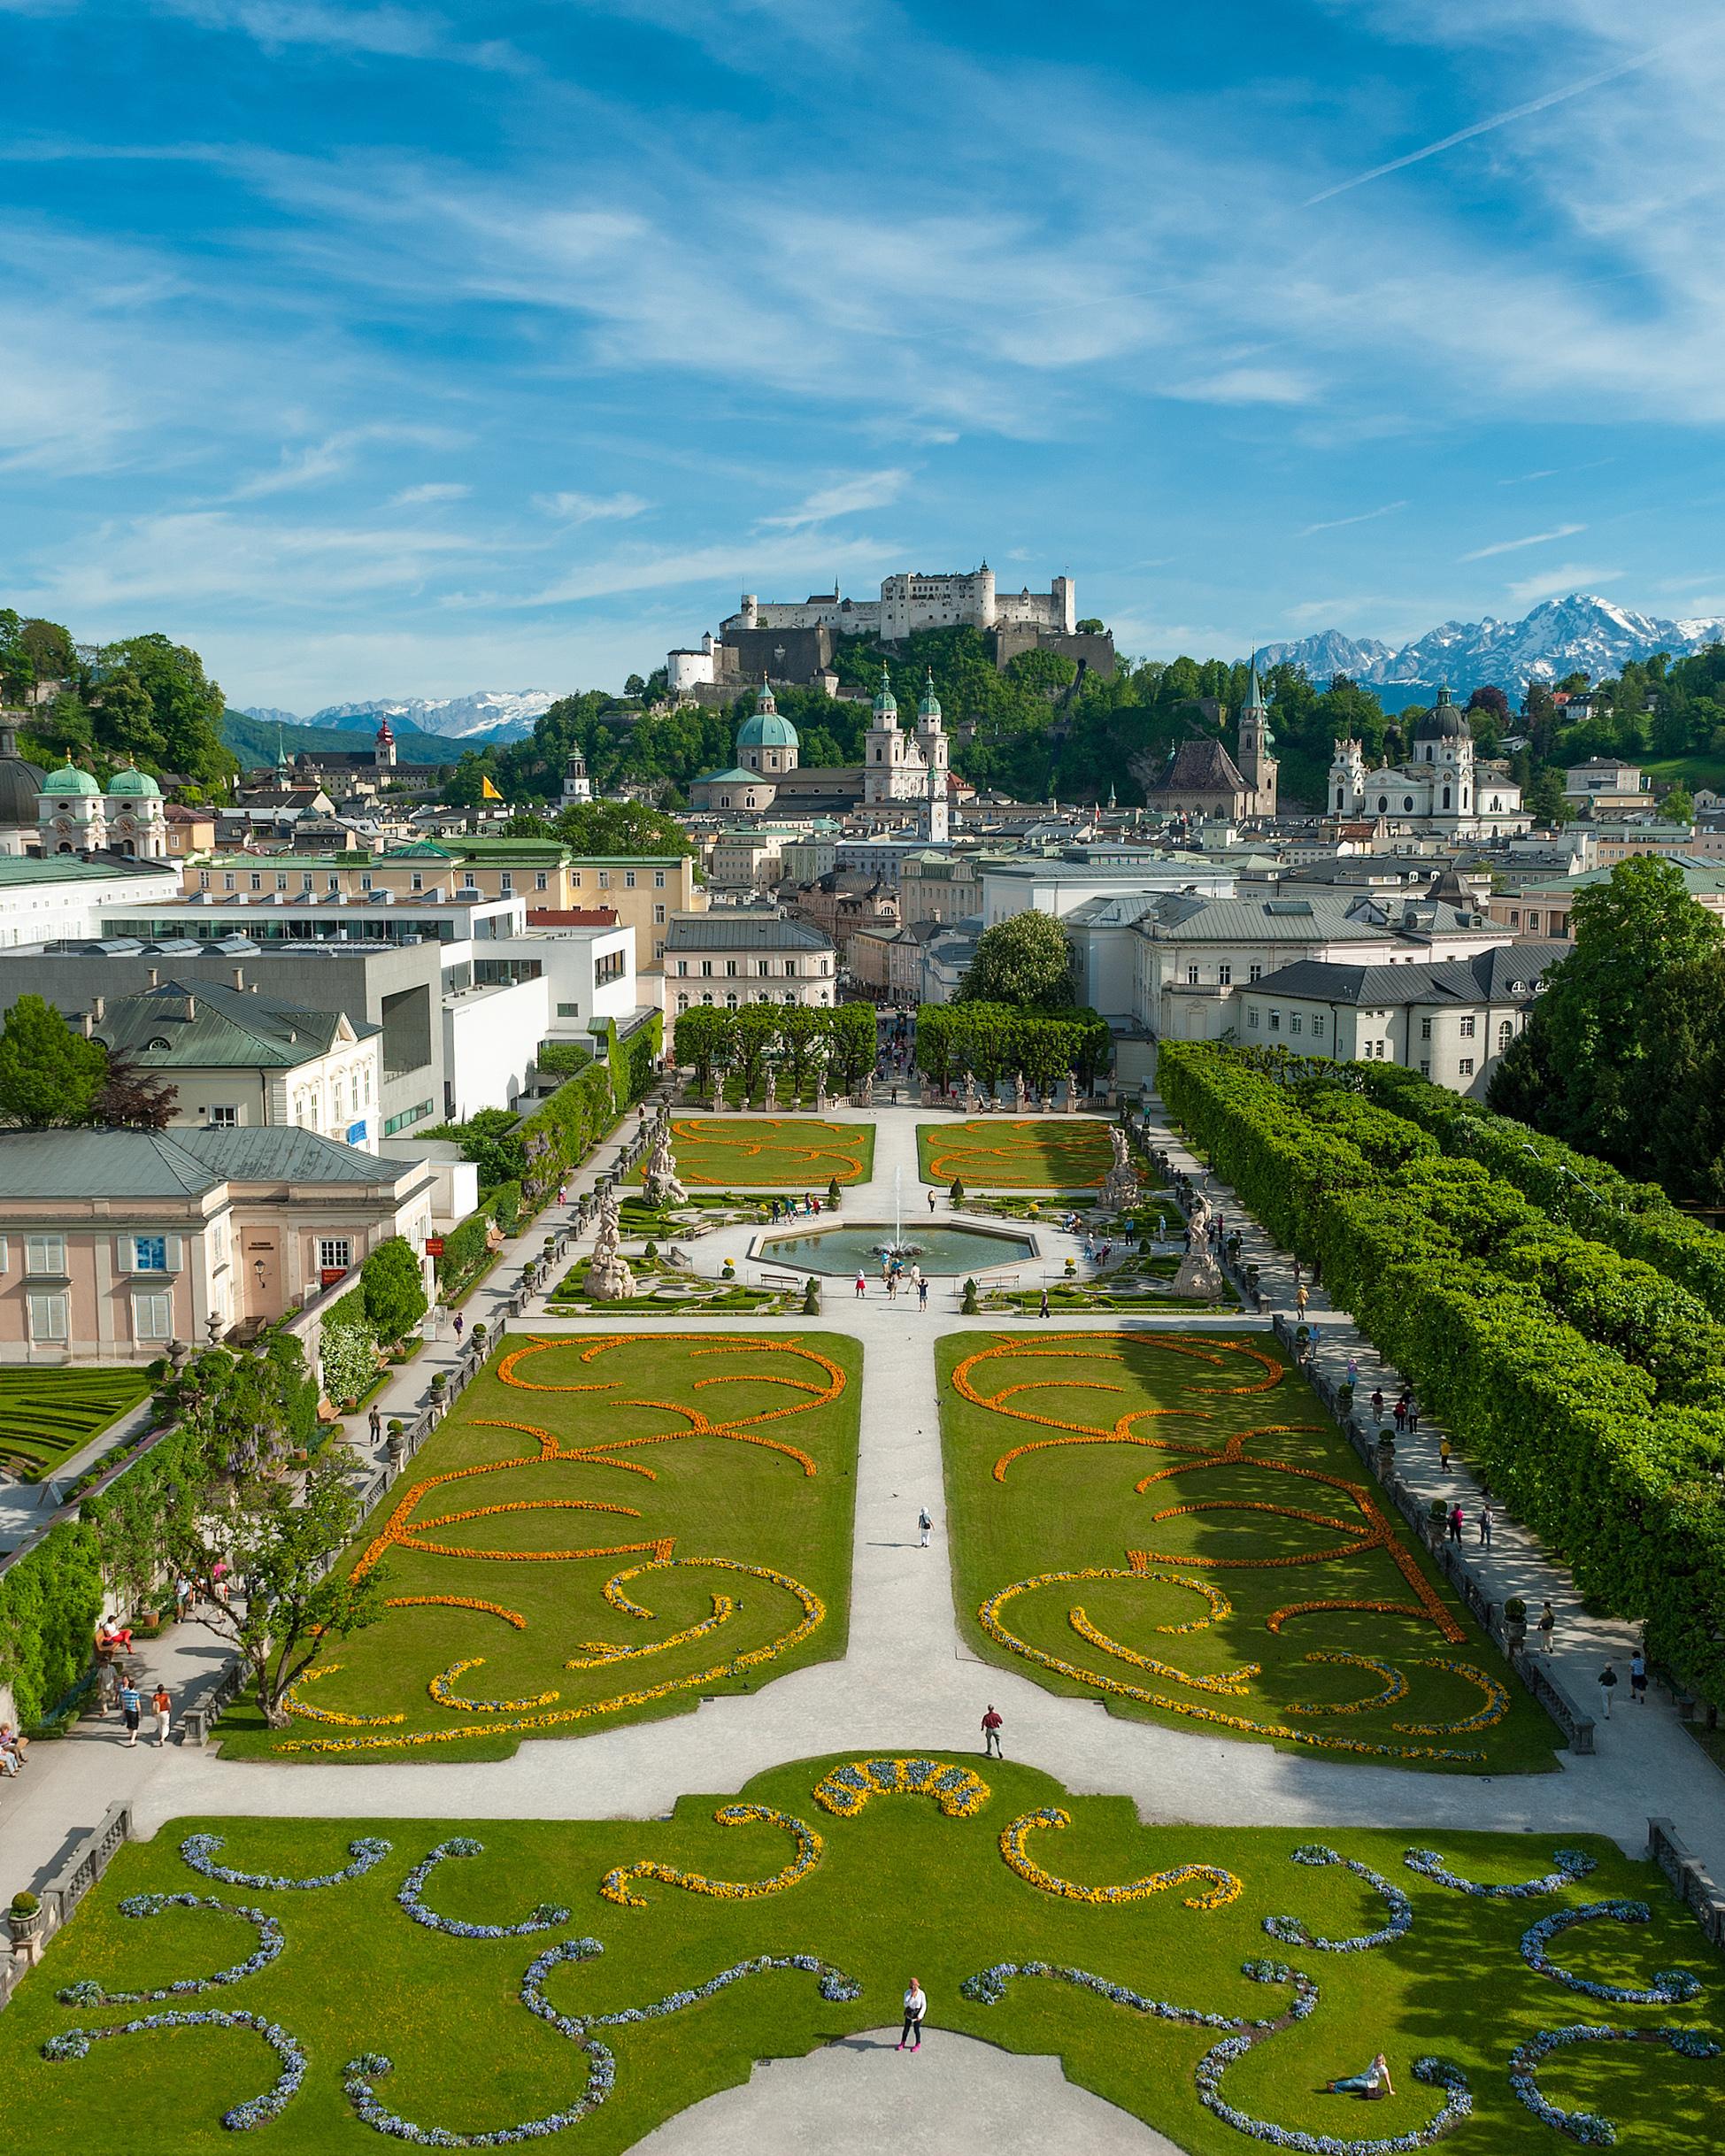 filming-locations-wedding-venues-mirabel-gardens-sound-of-music-0215.jpg